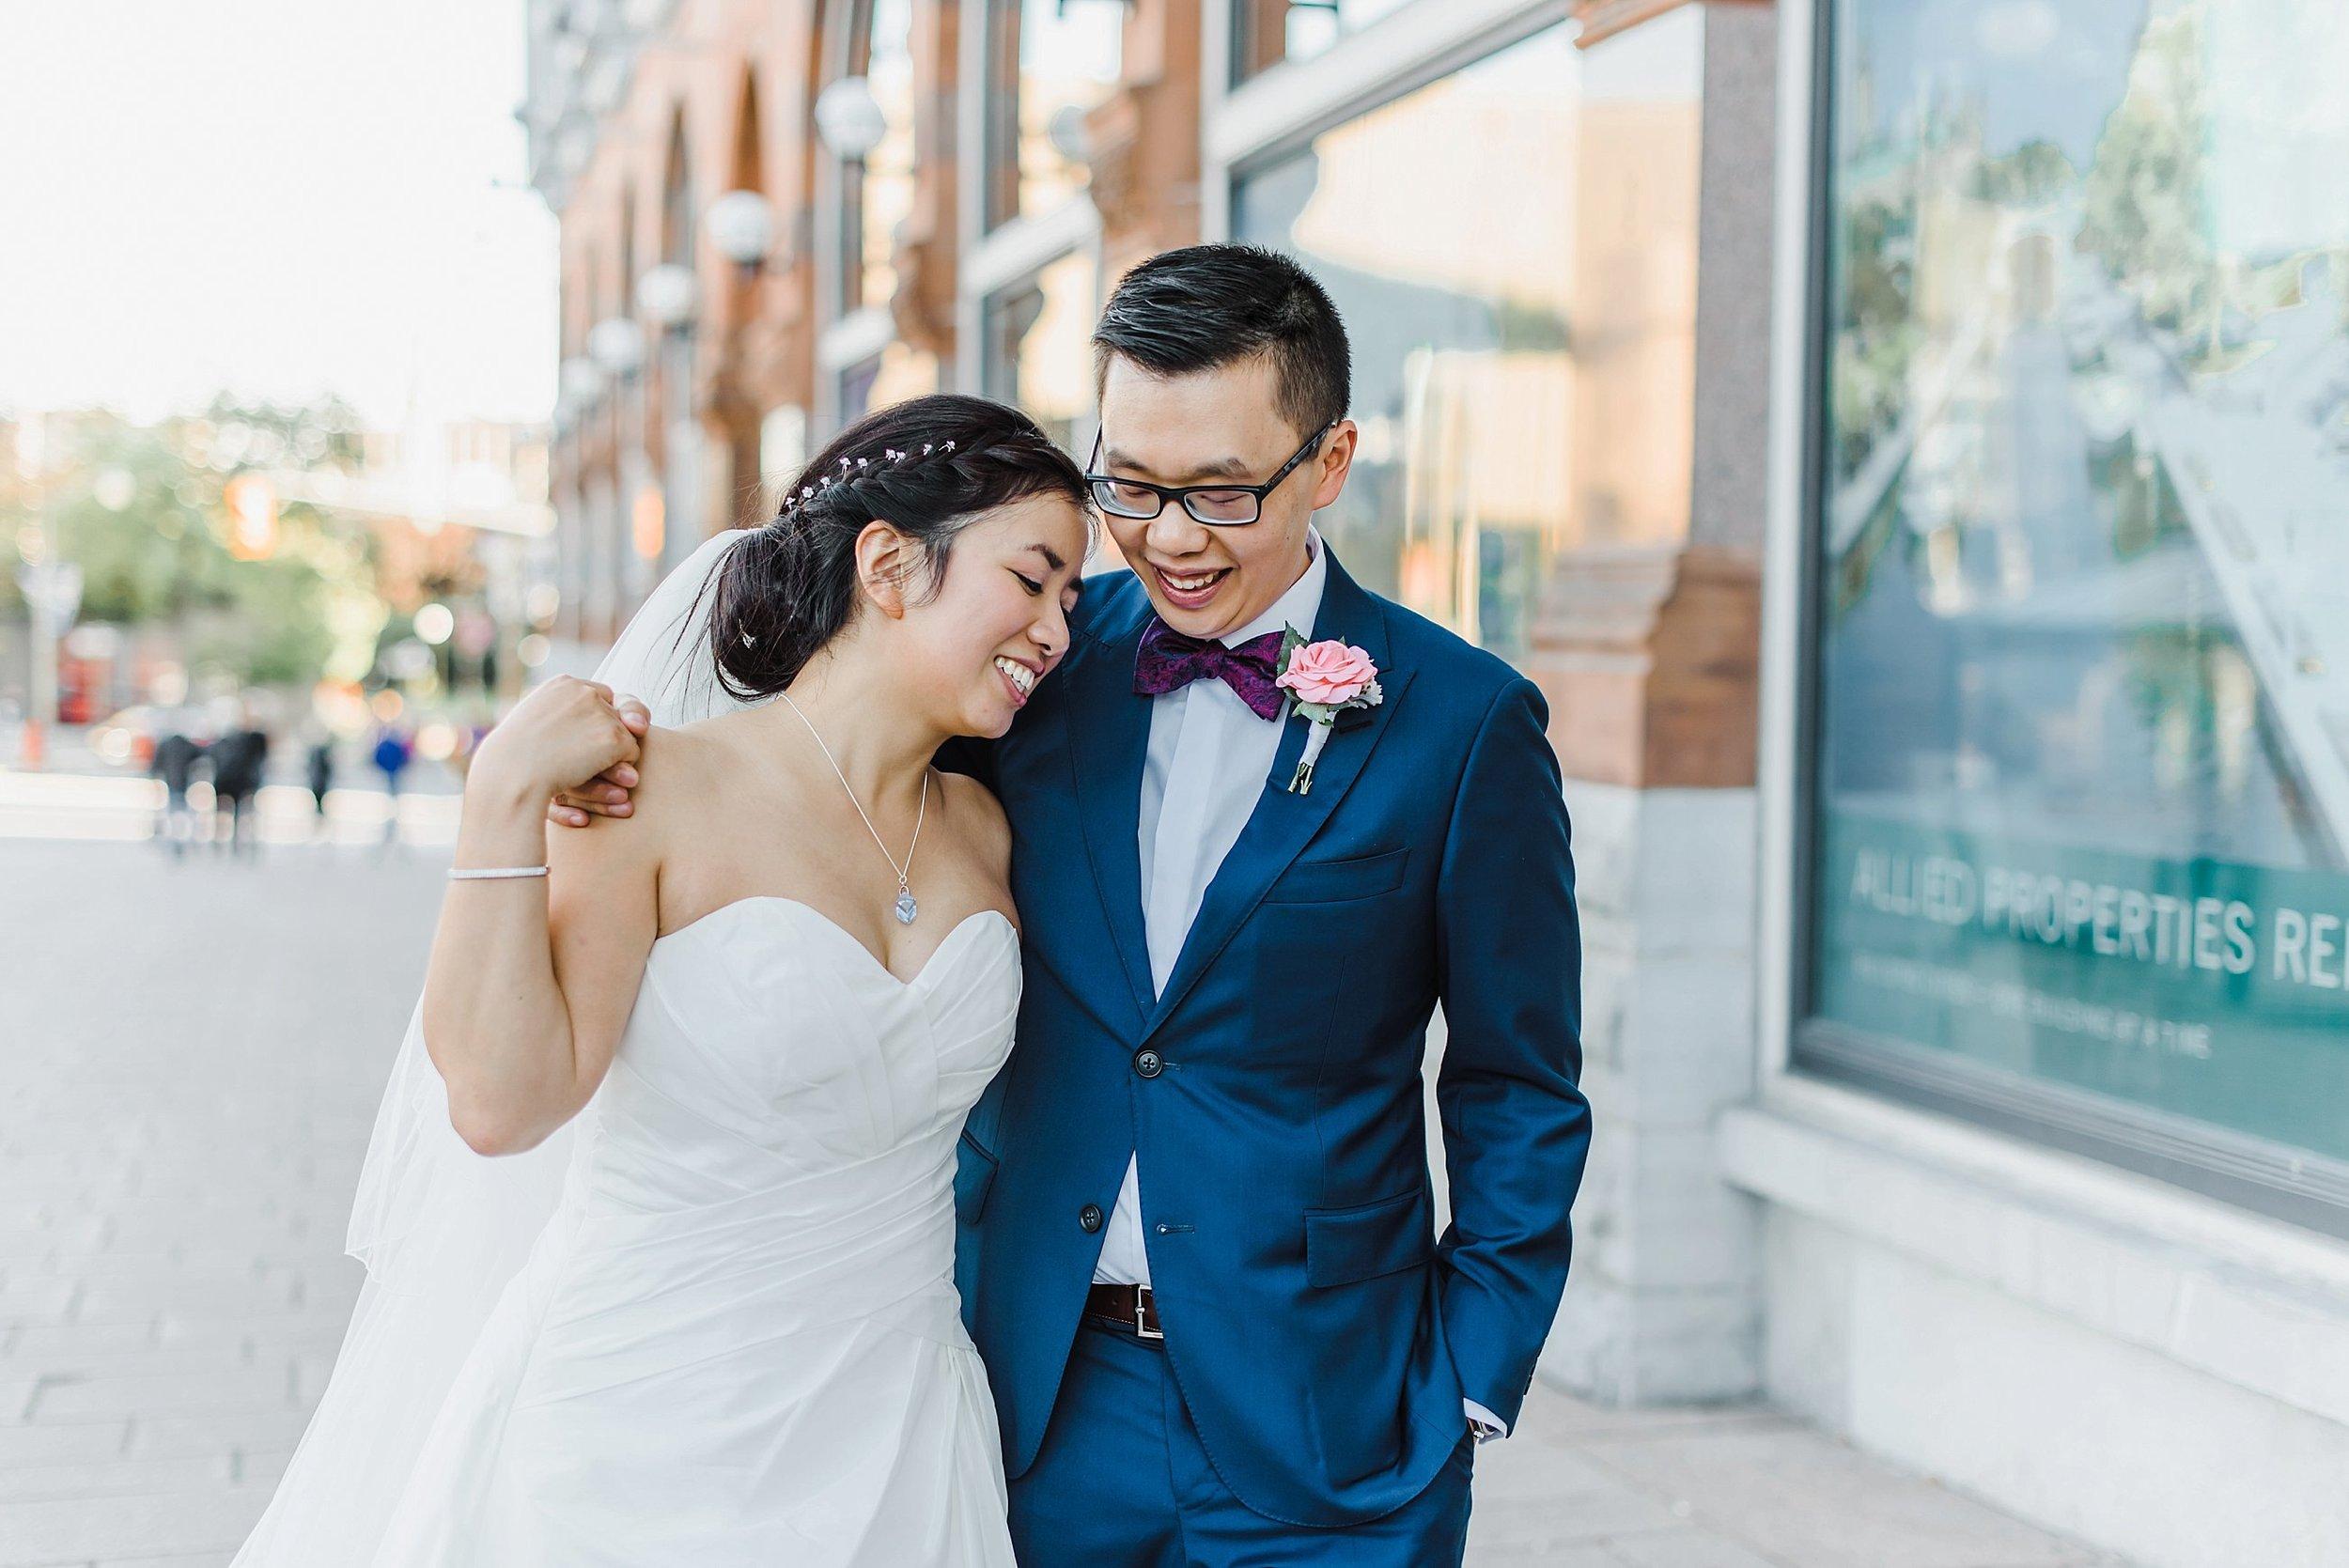 light airy indie fine art ottawa wedding photographer | Ali and Batoul Photography_1535.jpg